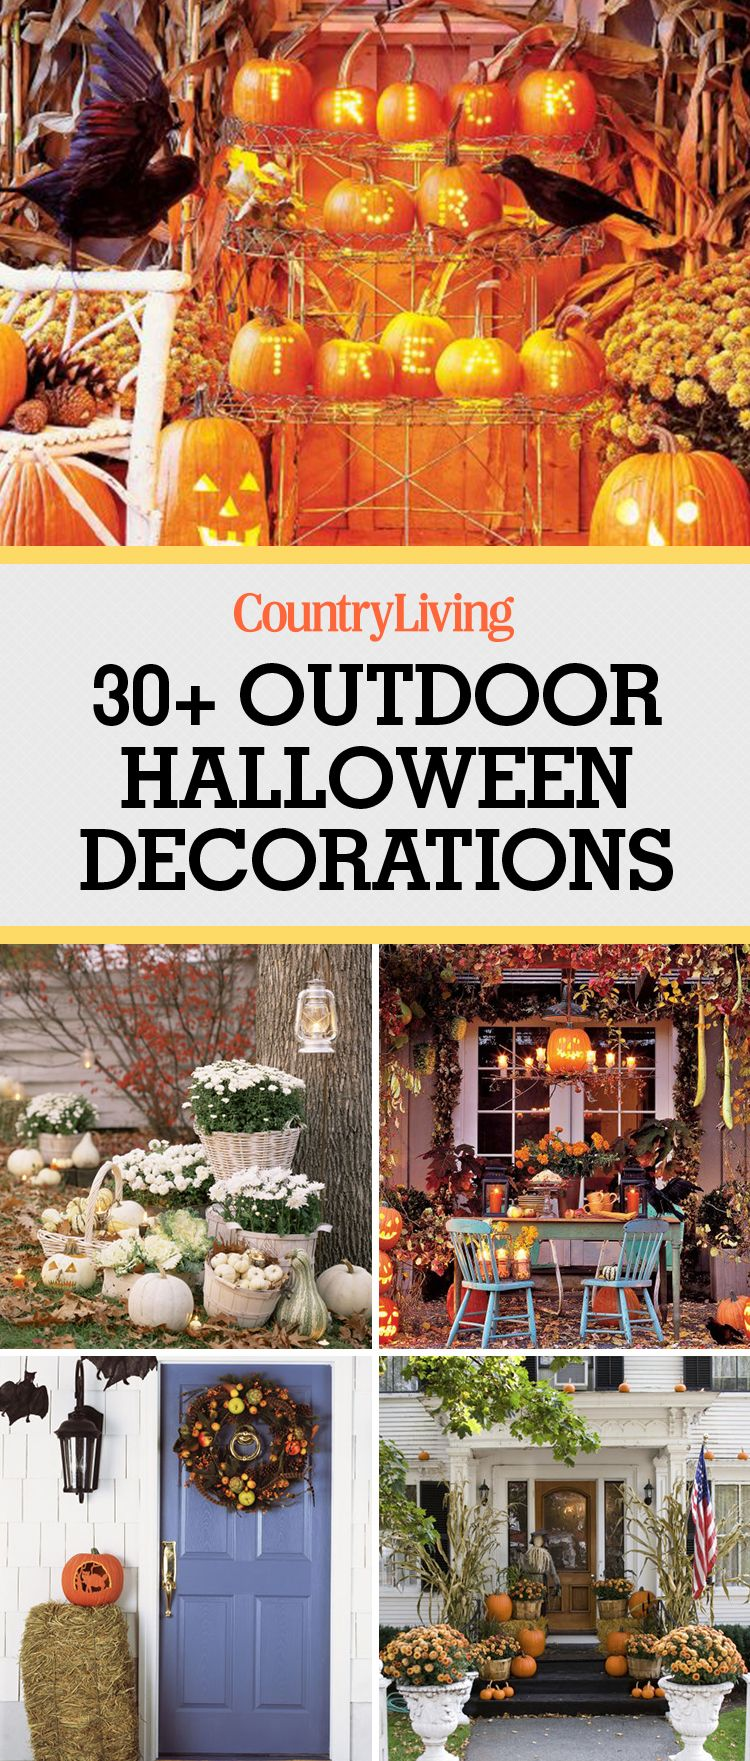 30+ Best Outdoor Halloween Decoration Ideas   Easy Halloween Yard And Porch  Decor